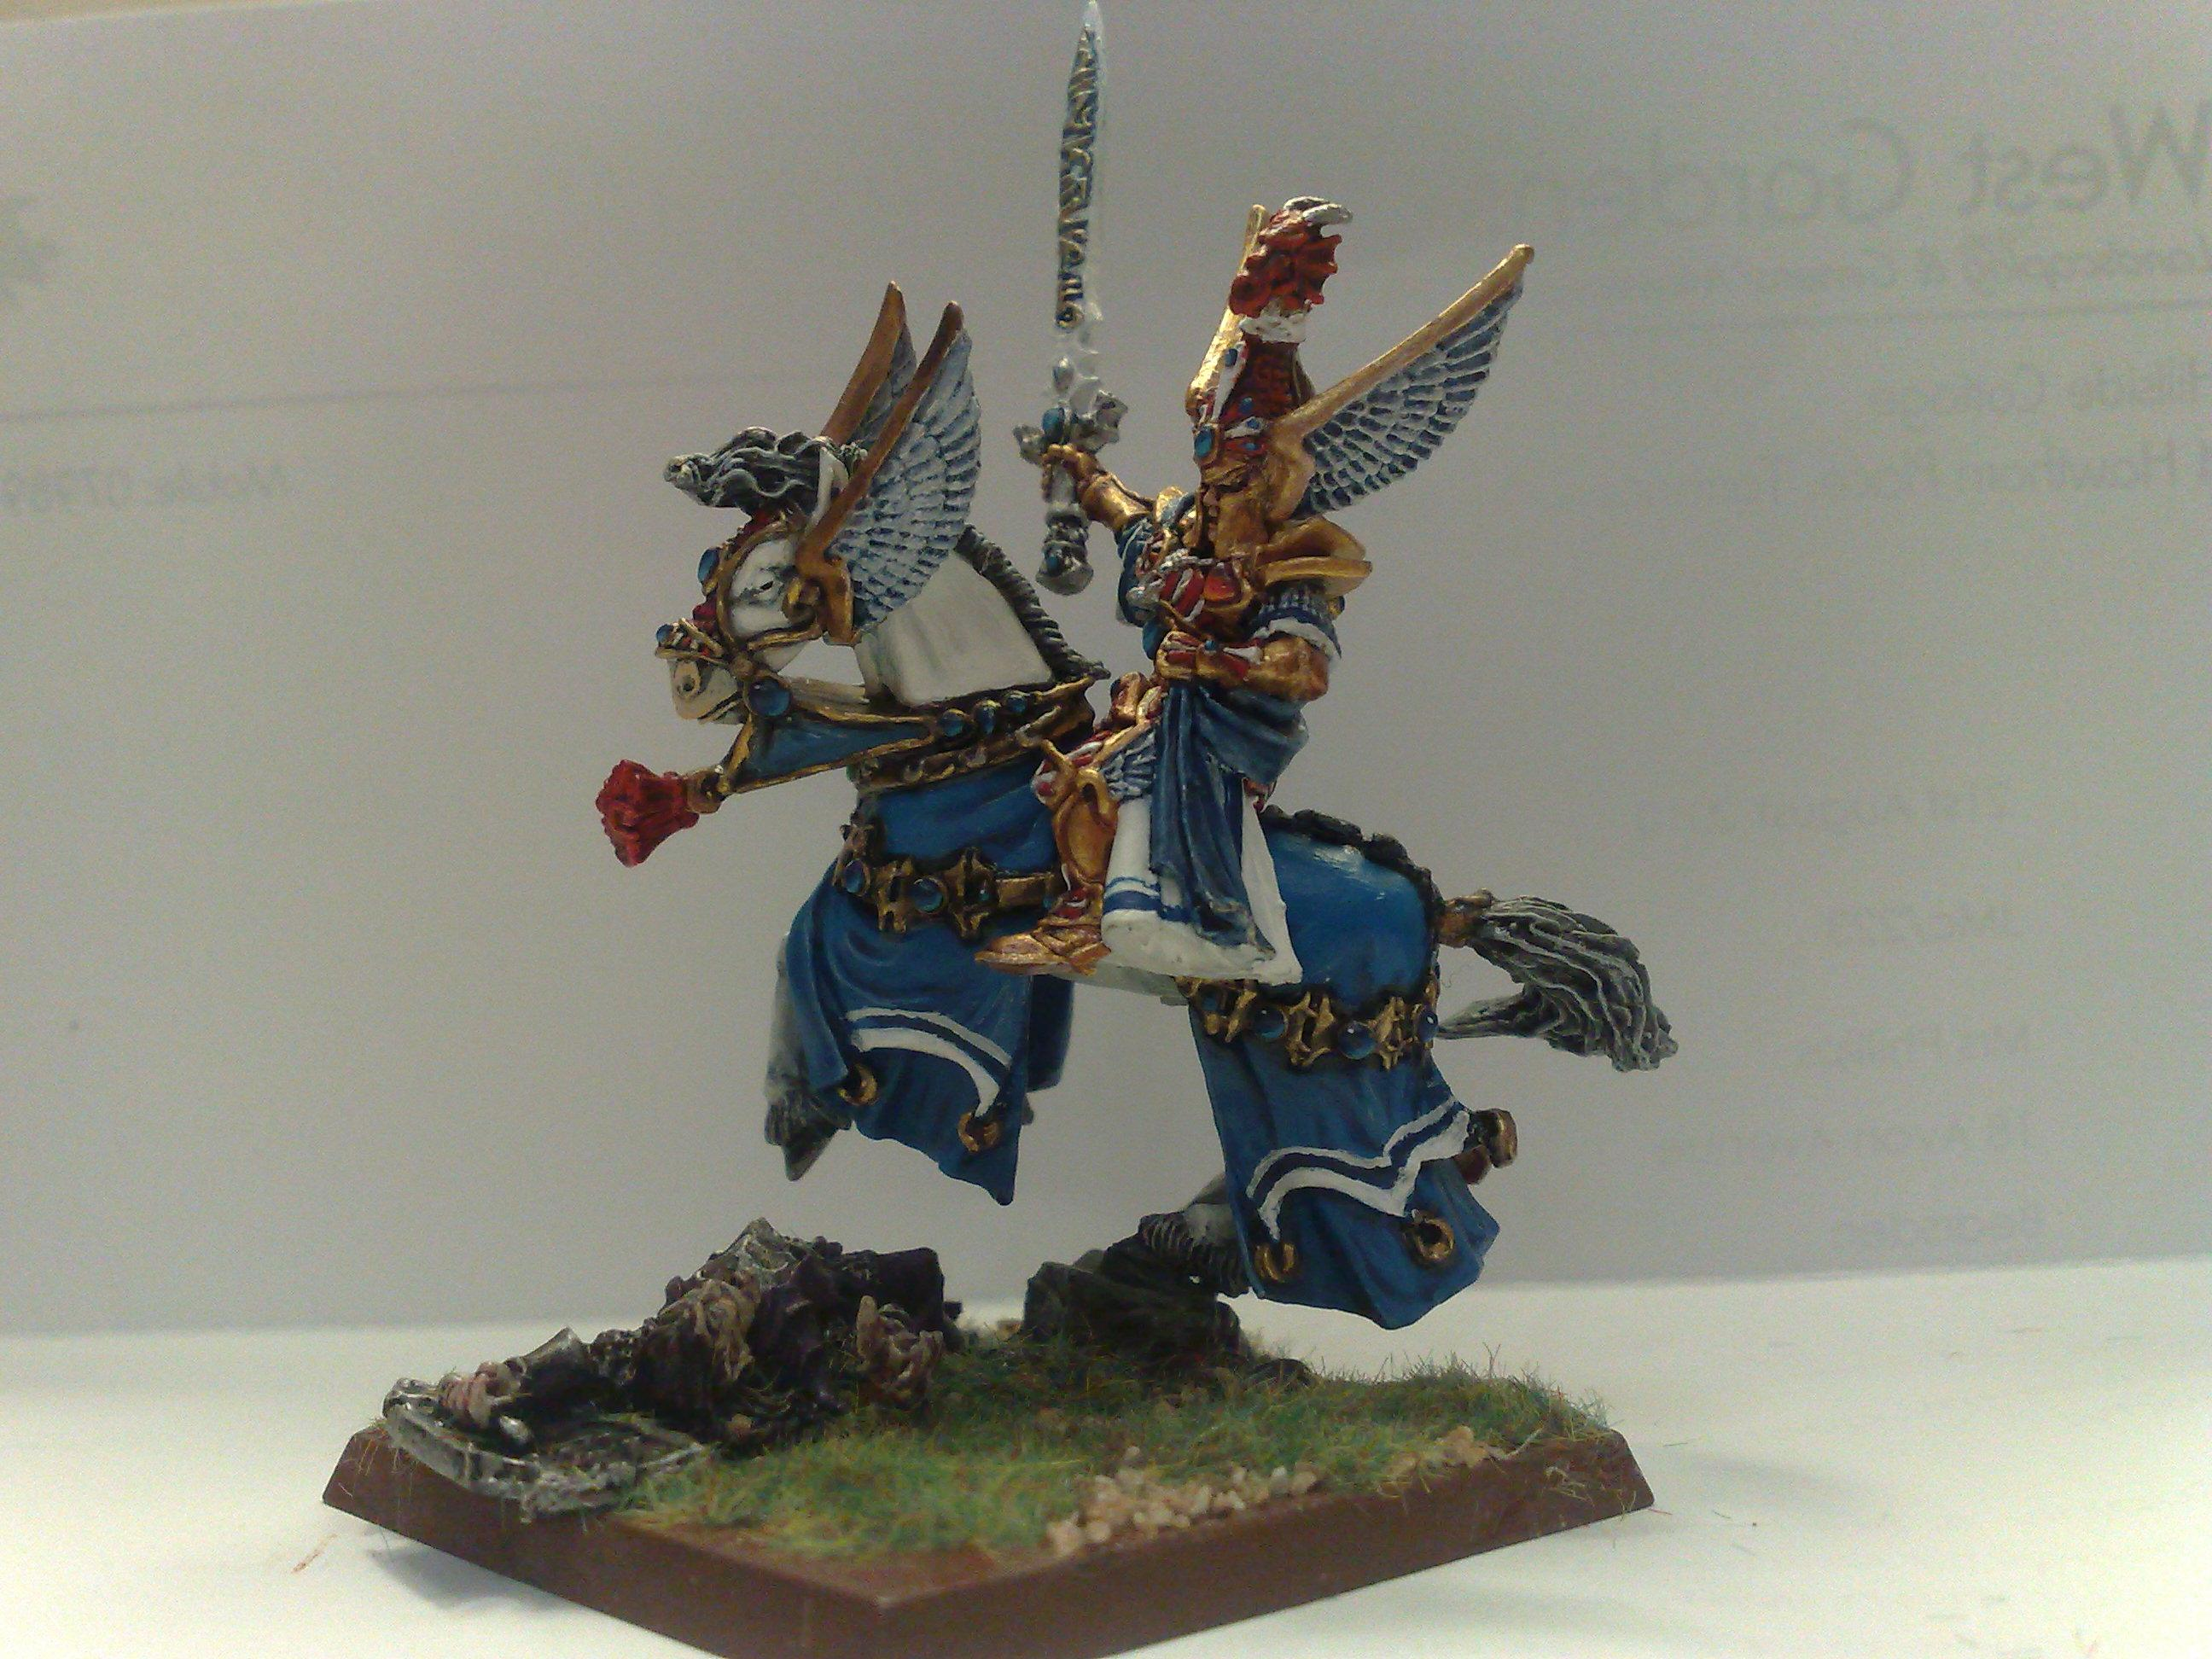 Champion, Defender, General, High Elves, Horse, Metallic, Mount, Tyrion, Ulthuan, Warhammer Fantasy, Wfb